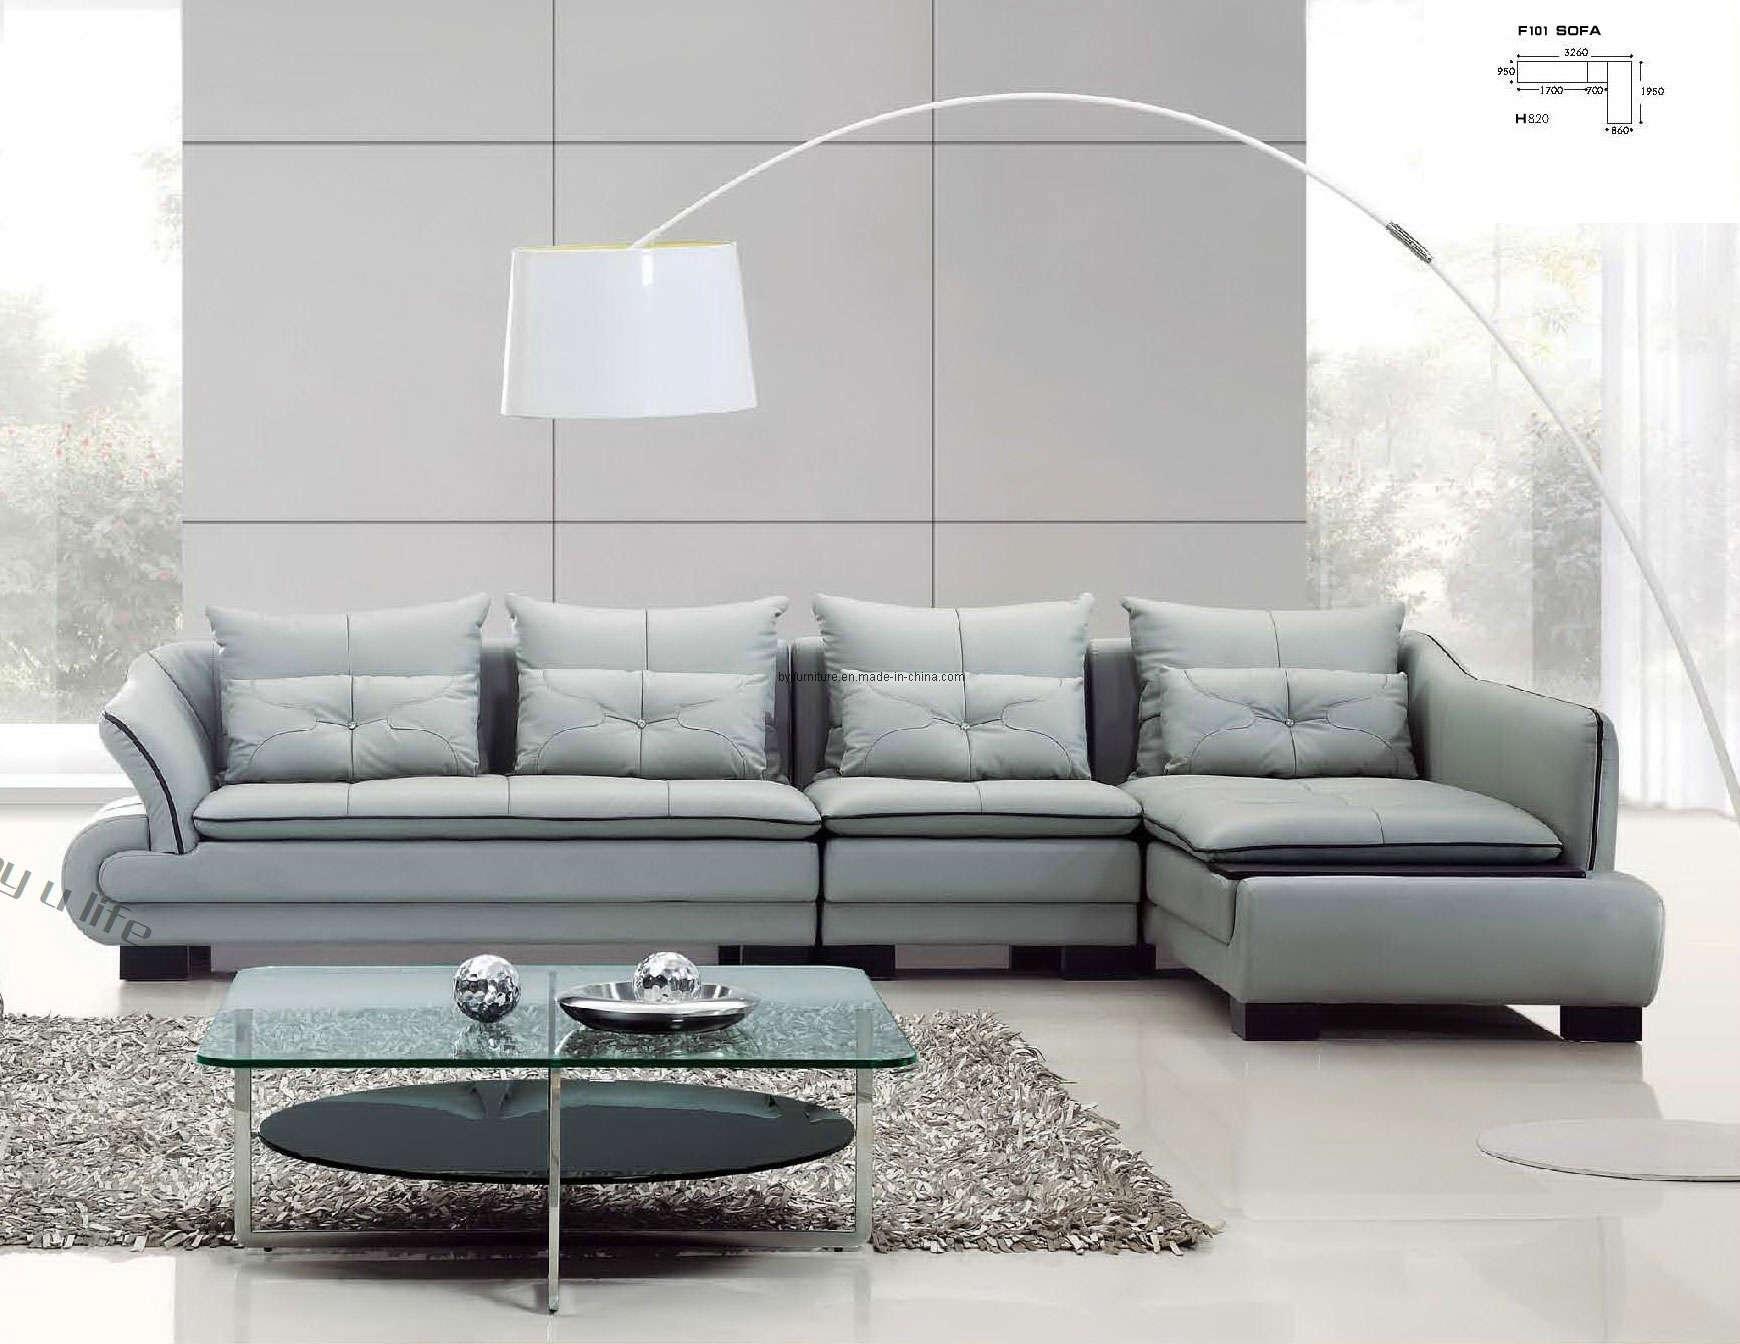 Sofa Ideas: Sectional Sofas at Ebay (Explore #4 of 10 Photos)